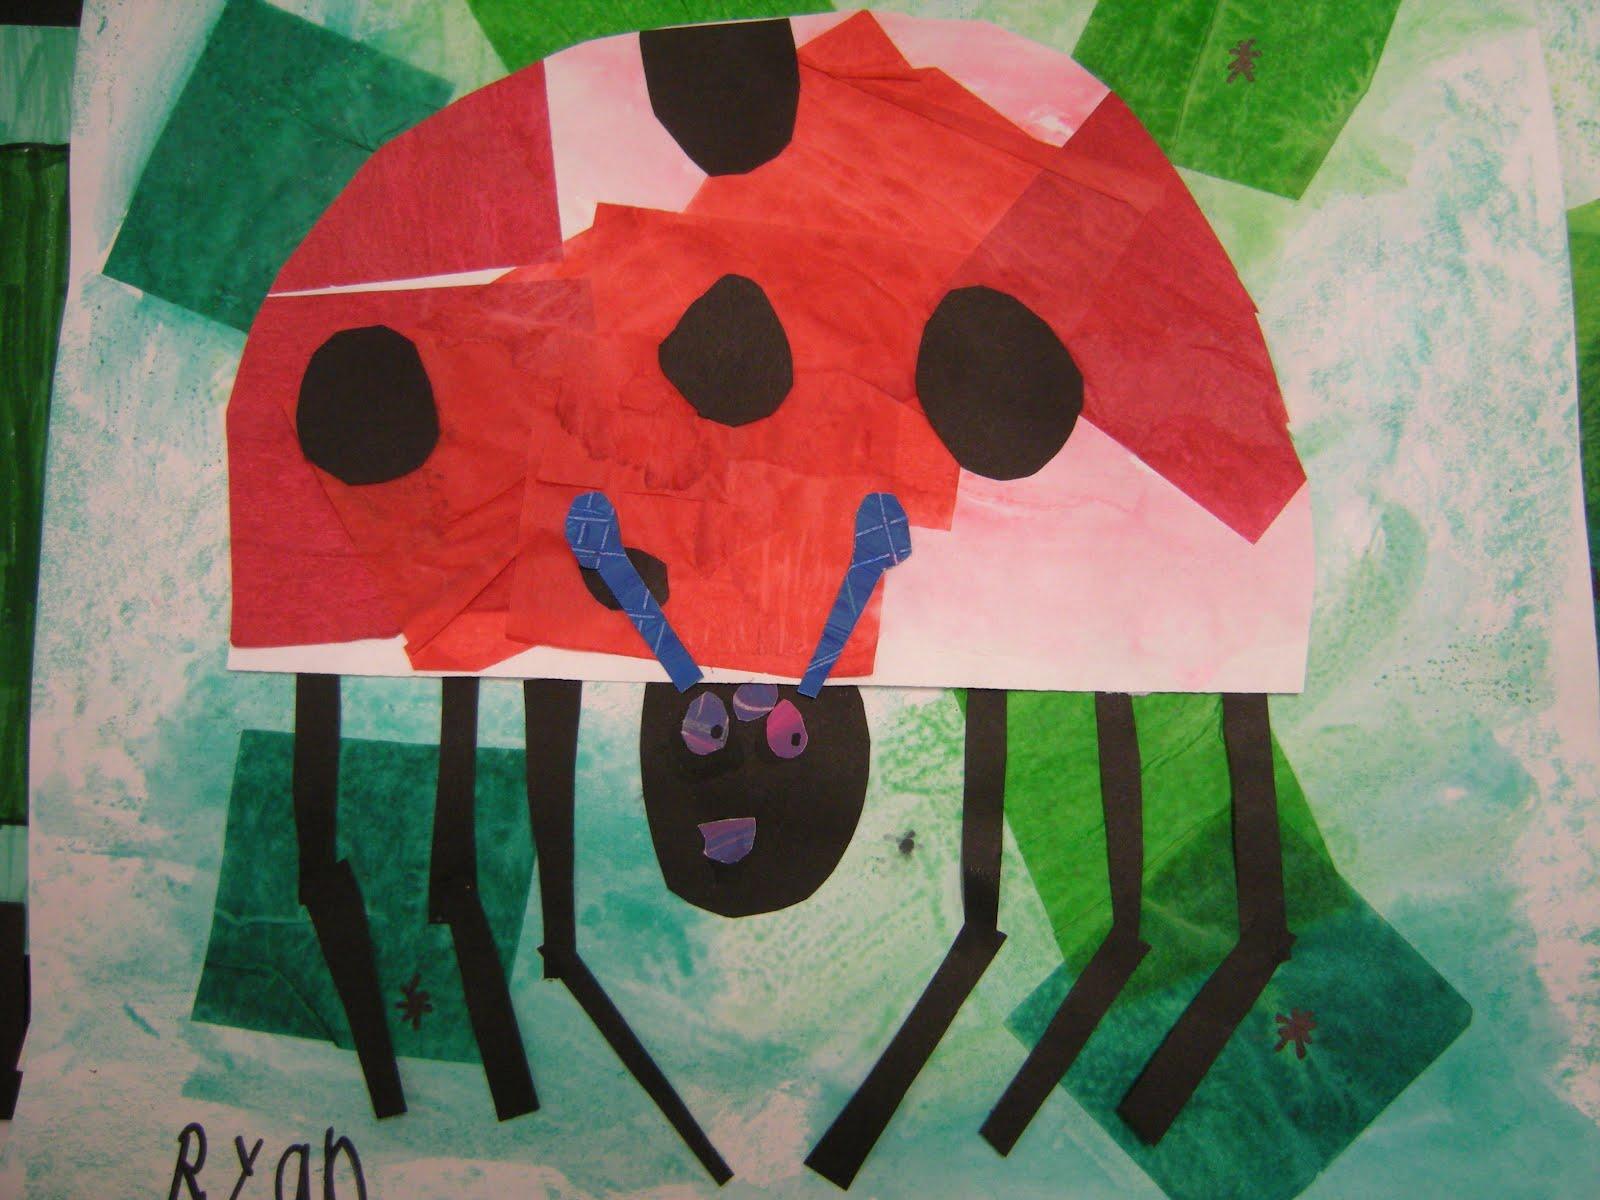 Artolazzi The Grouchy Ladybug